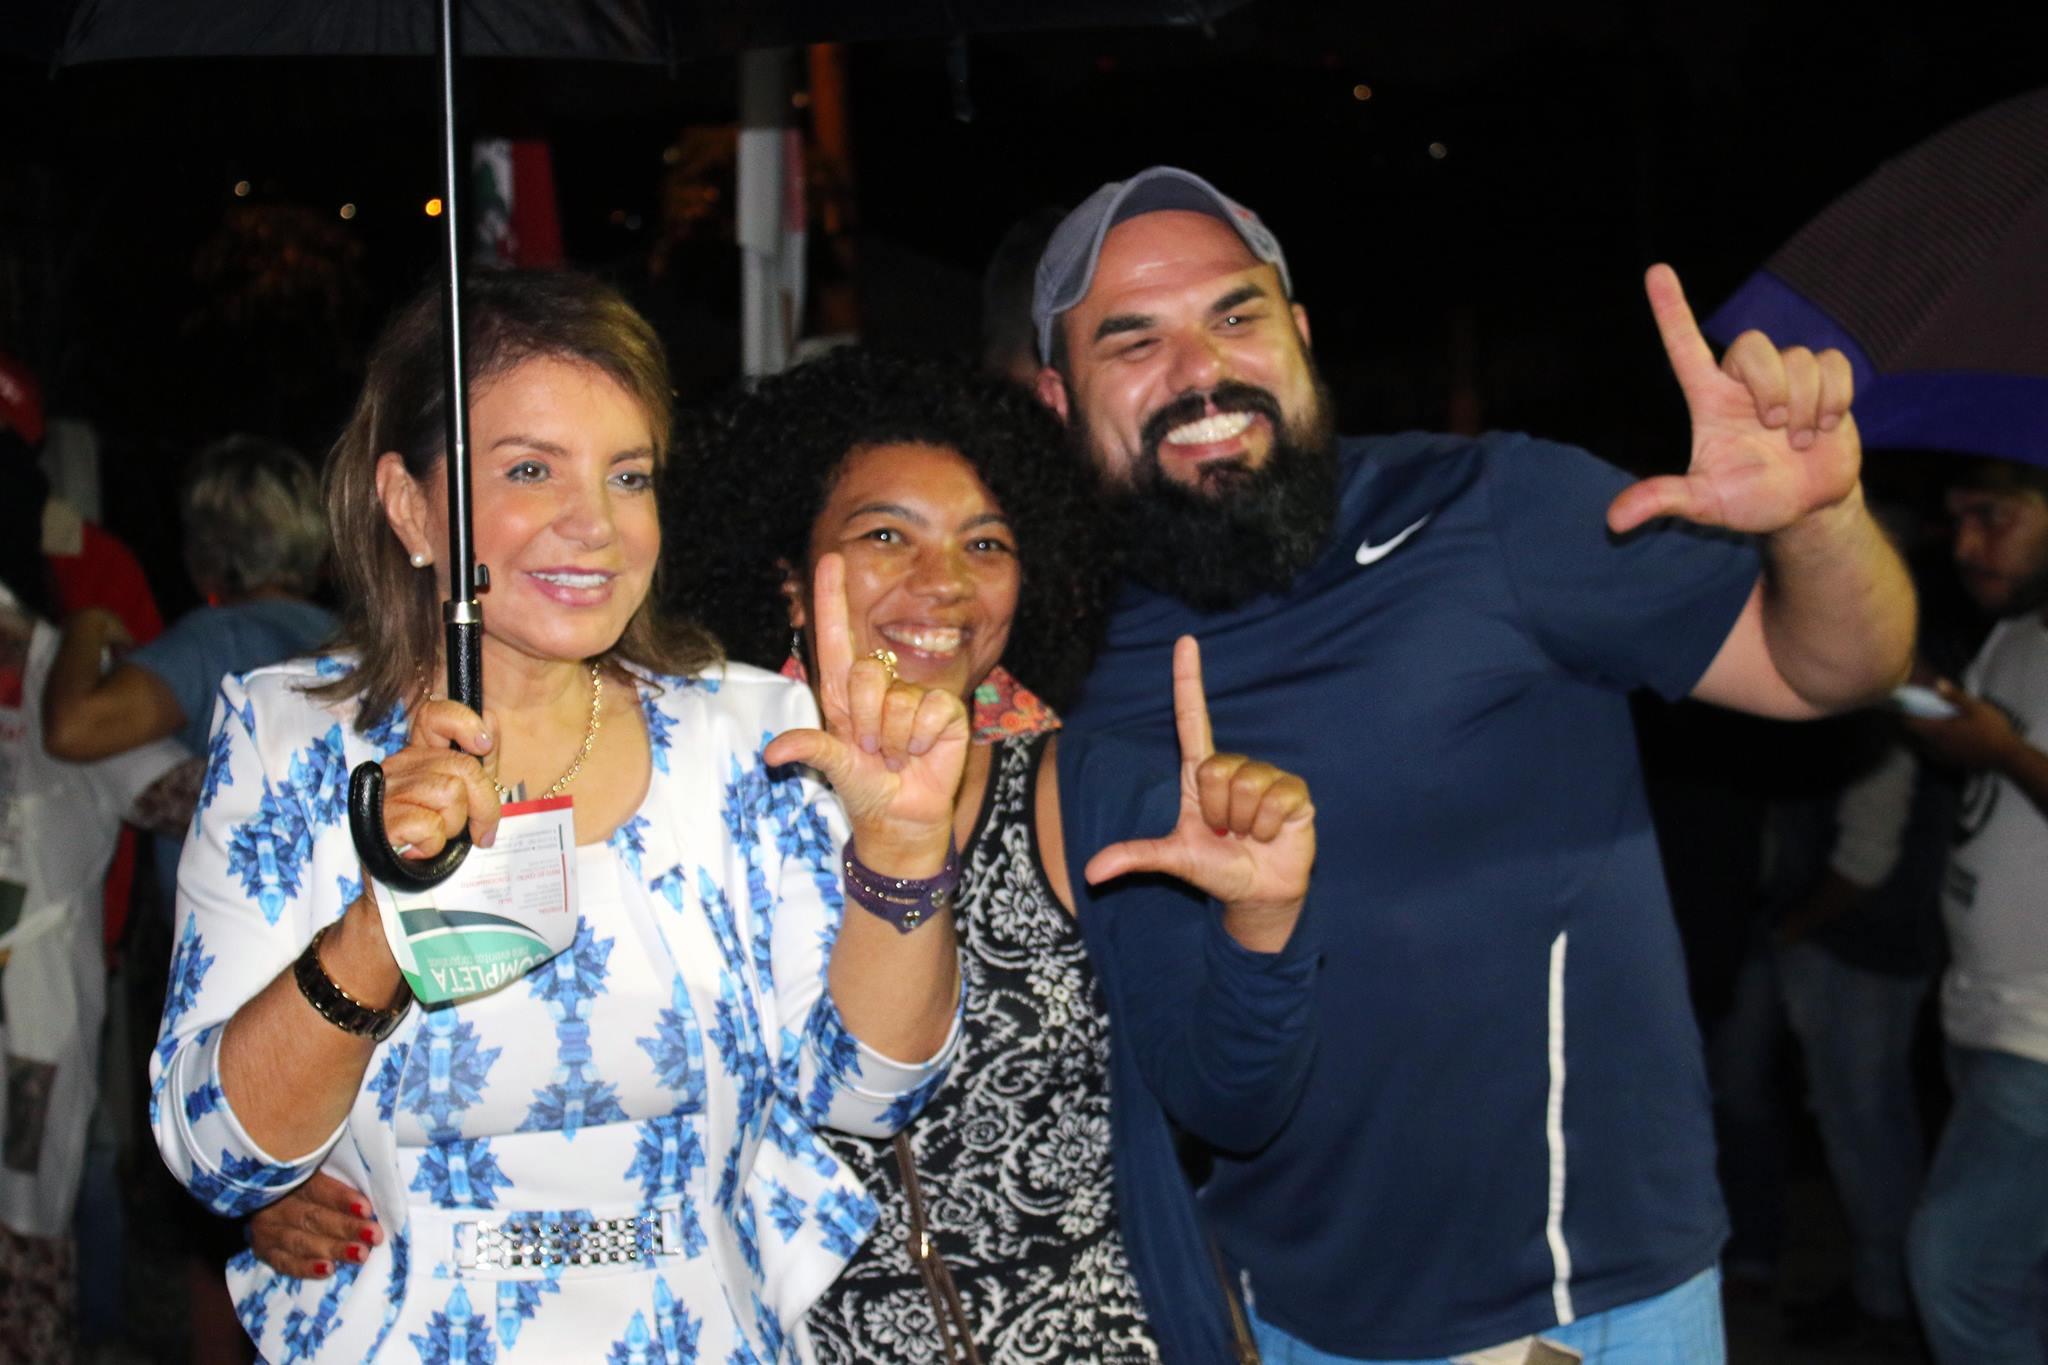 FOTO39-Jornalistas Livres